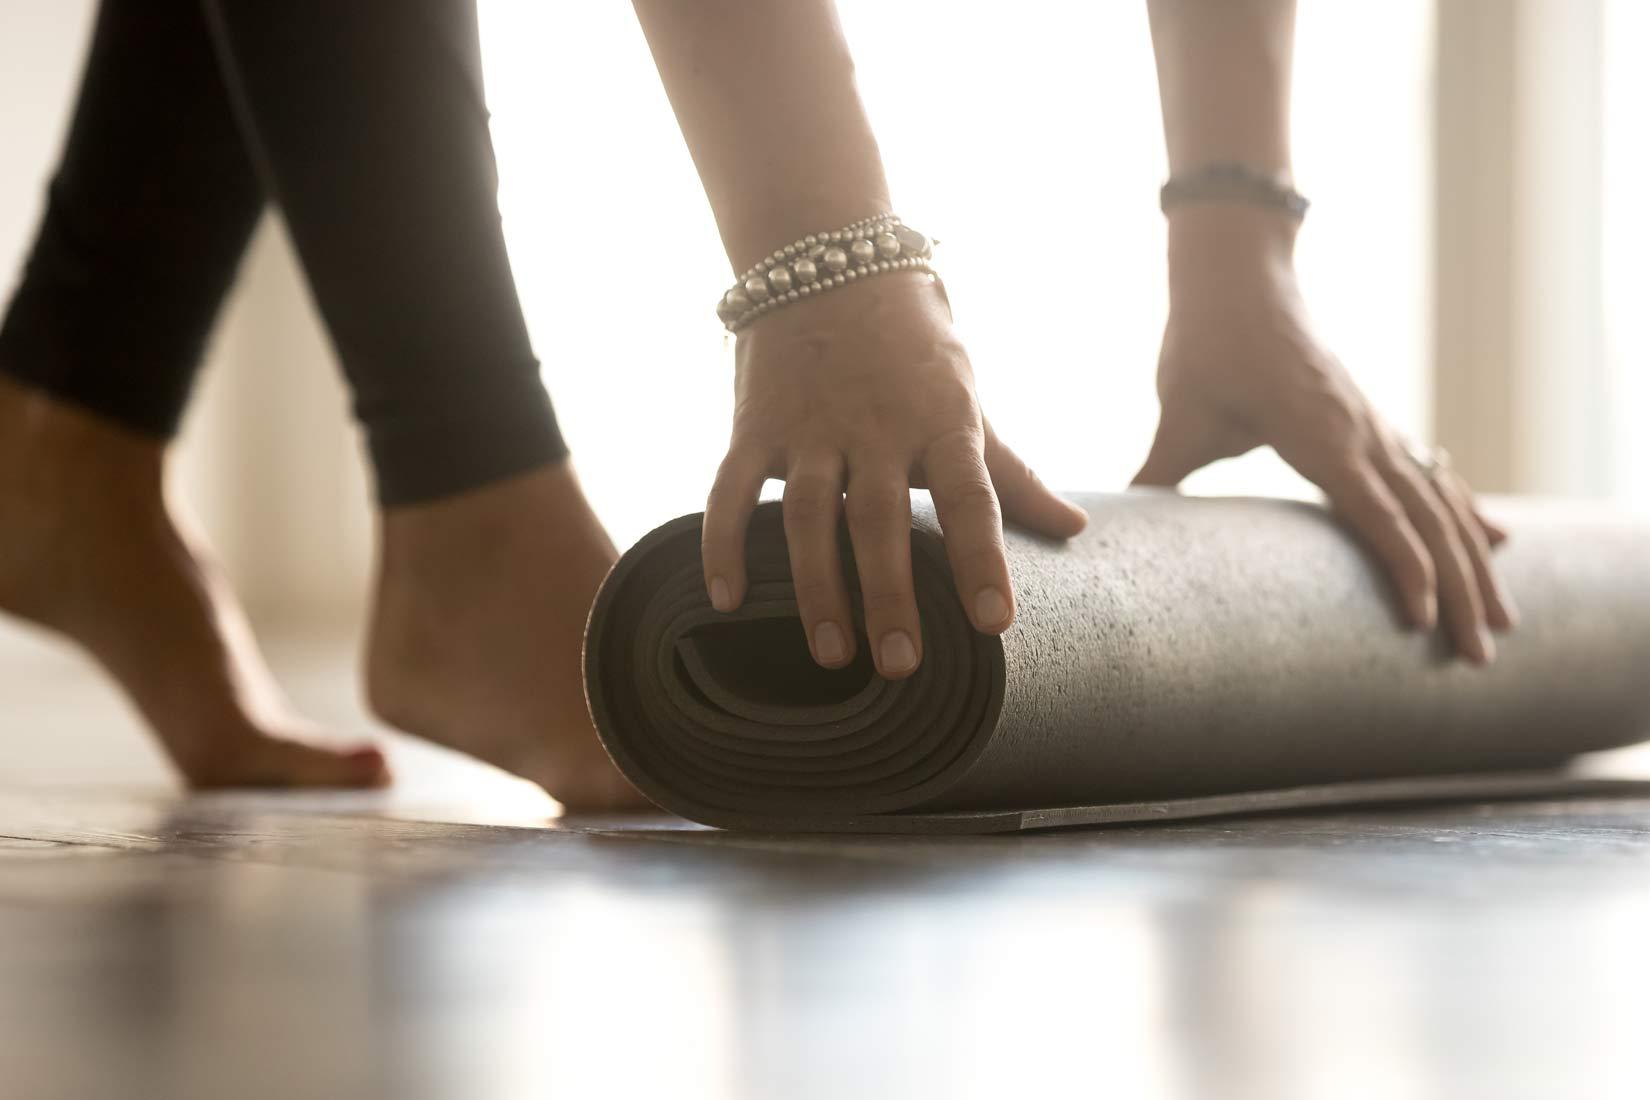 Mindful Hatha Flow Yoga - The Amethyst Cave